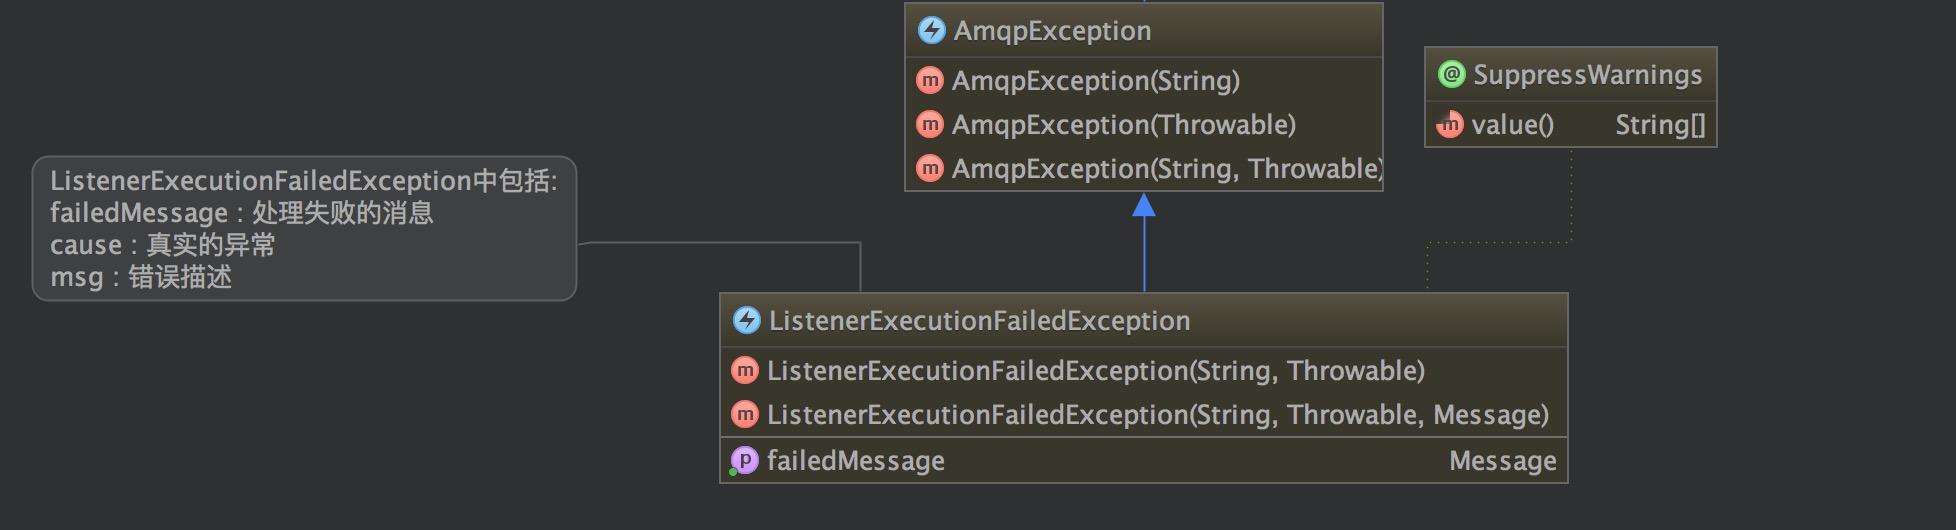 ListenerExecutionFailedException结构